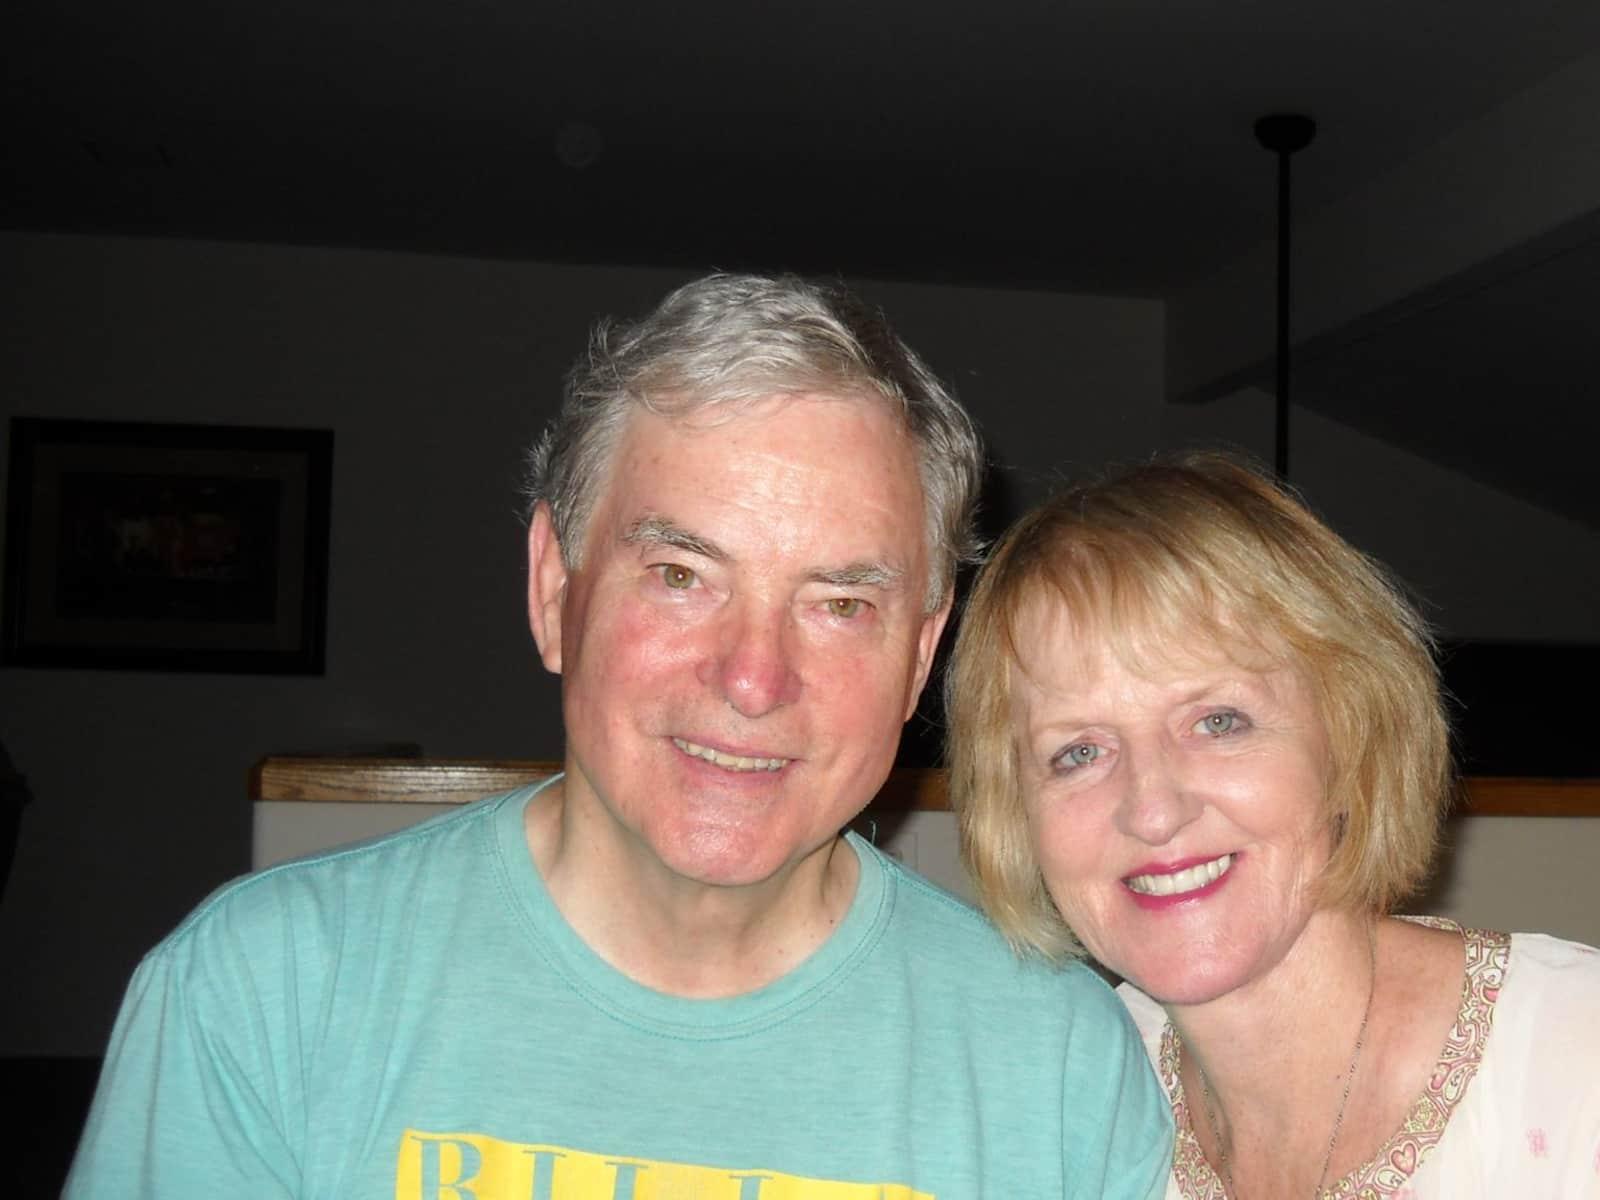 Alberta & Thomas from Phoenix, Arizona, United States